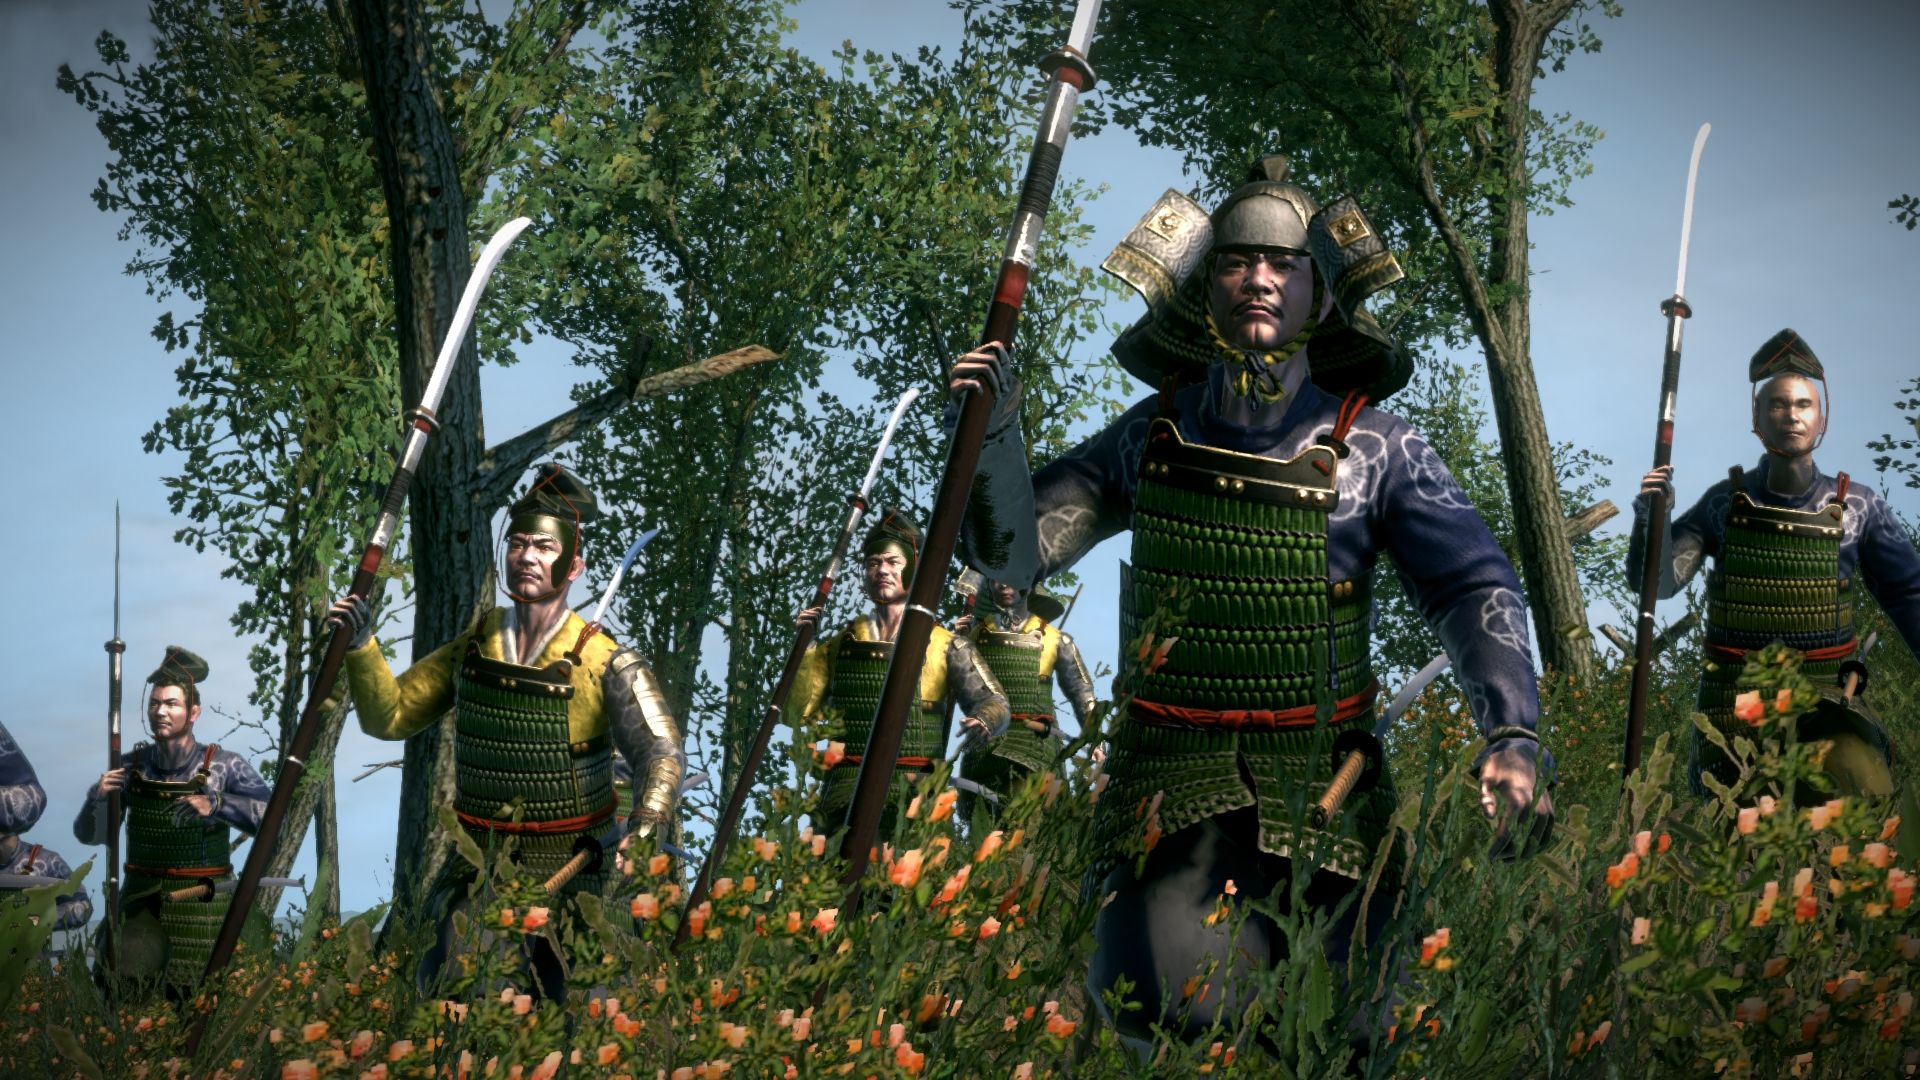 Total War Shogun 2 Fall Of The Samurai Wallpaper Kaufen Total War Shogun 2 Rise Of The Samurai Campaign